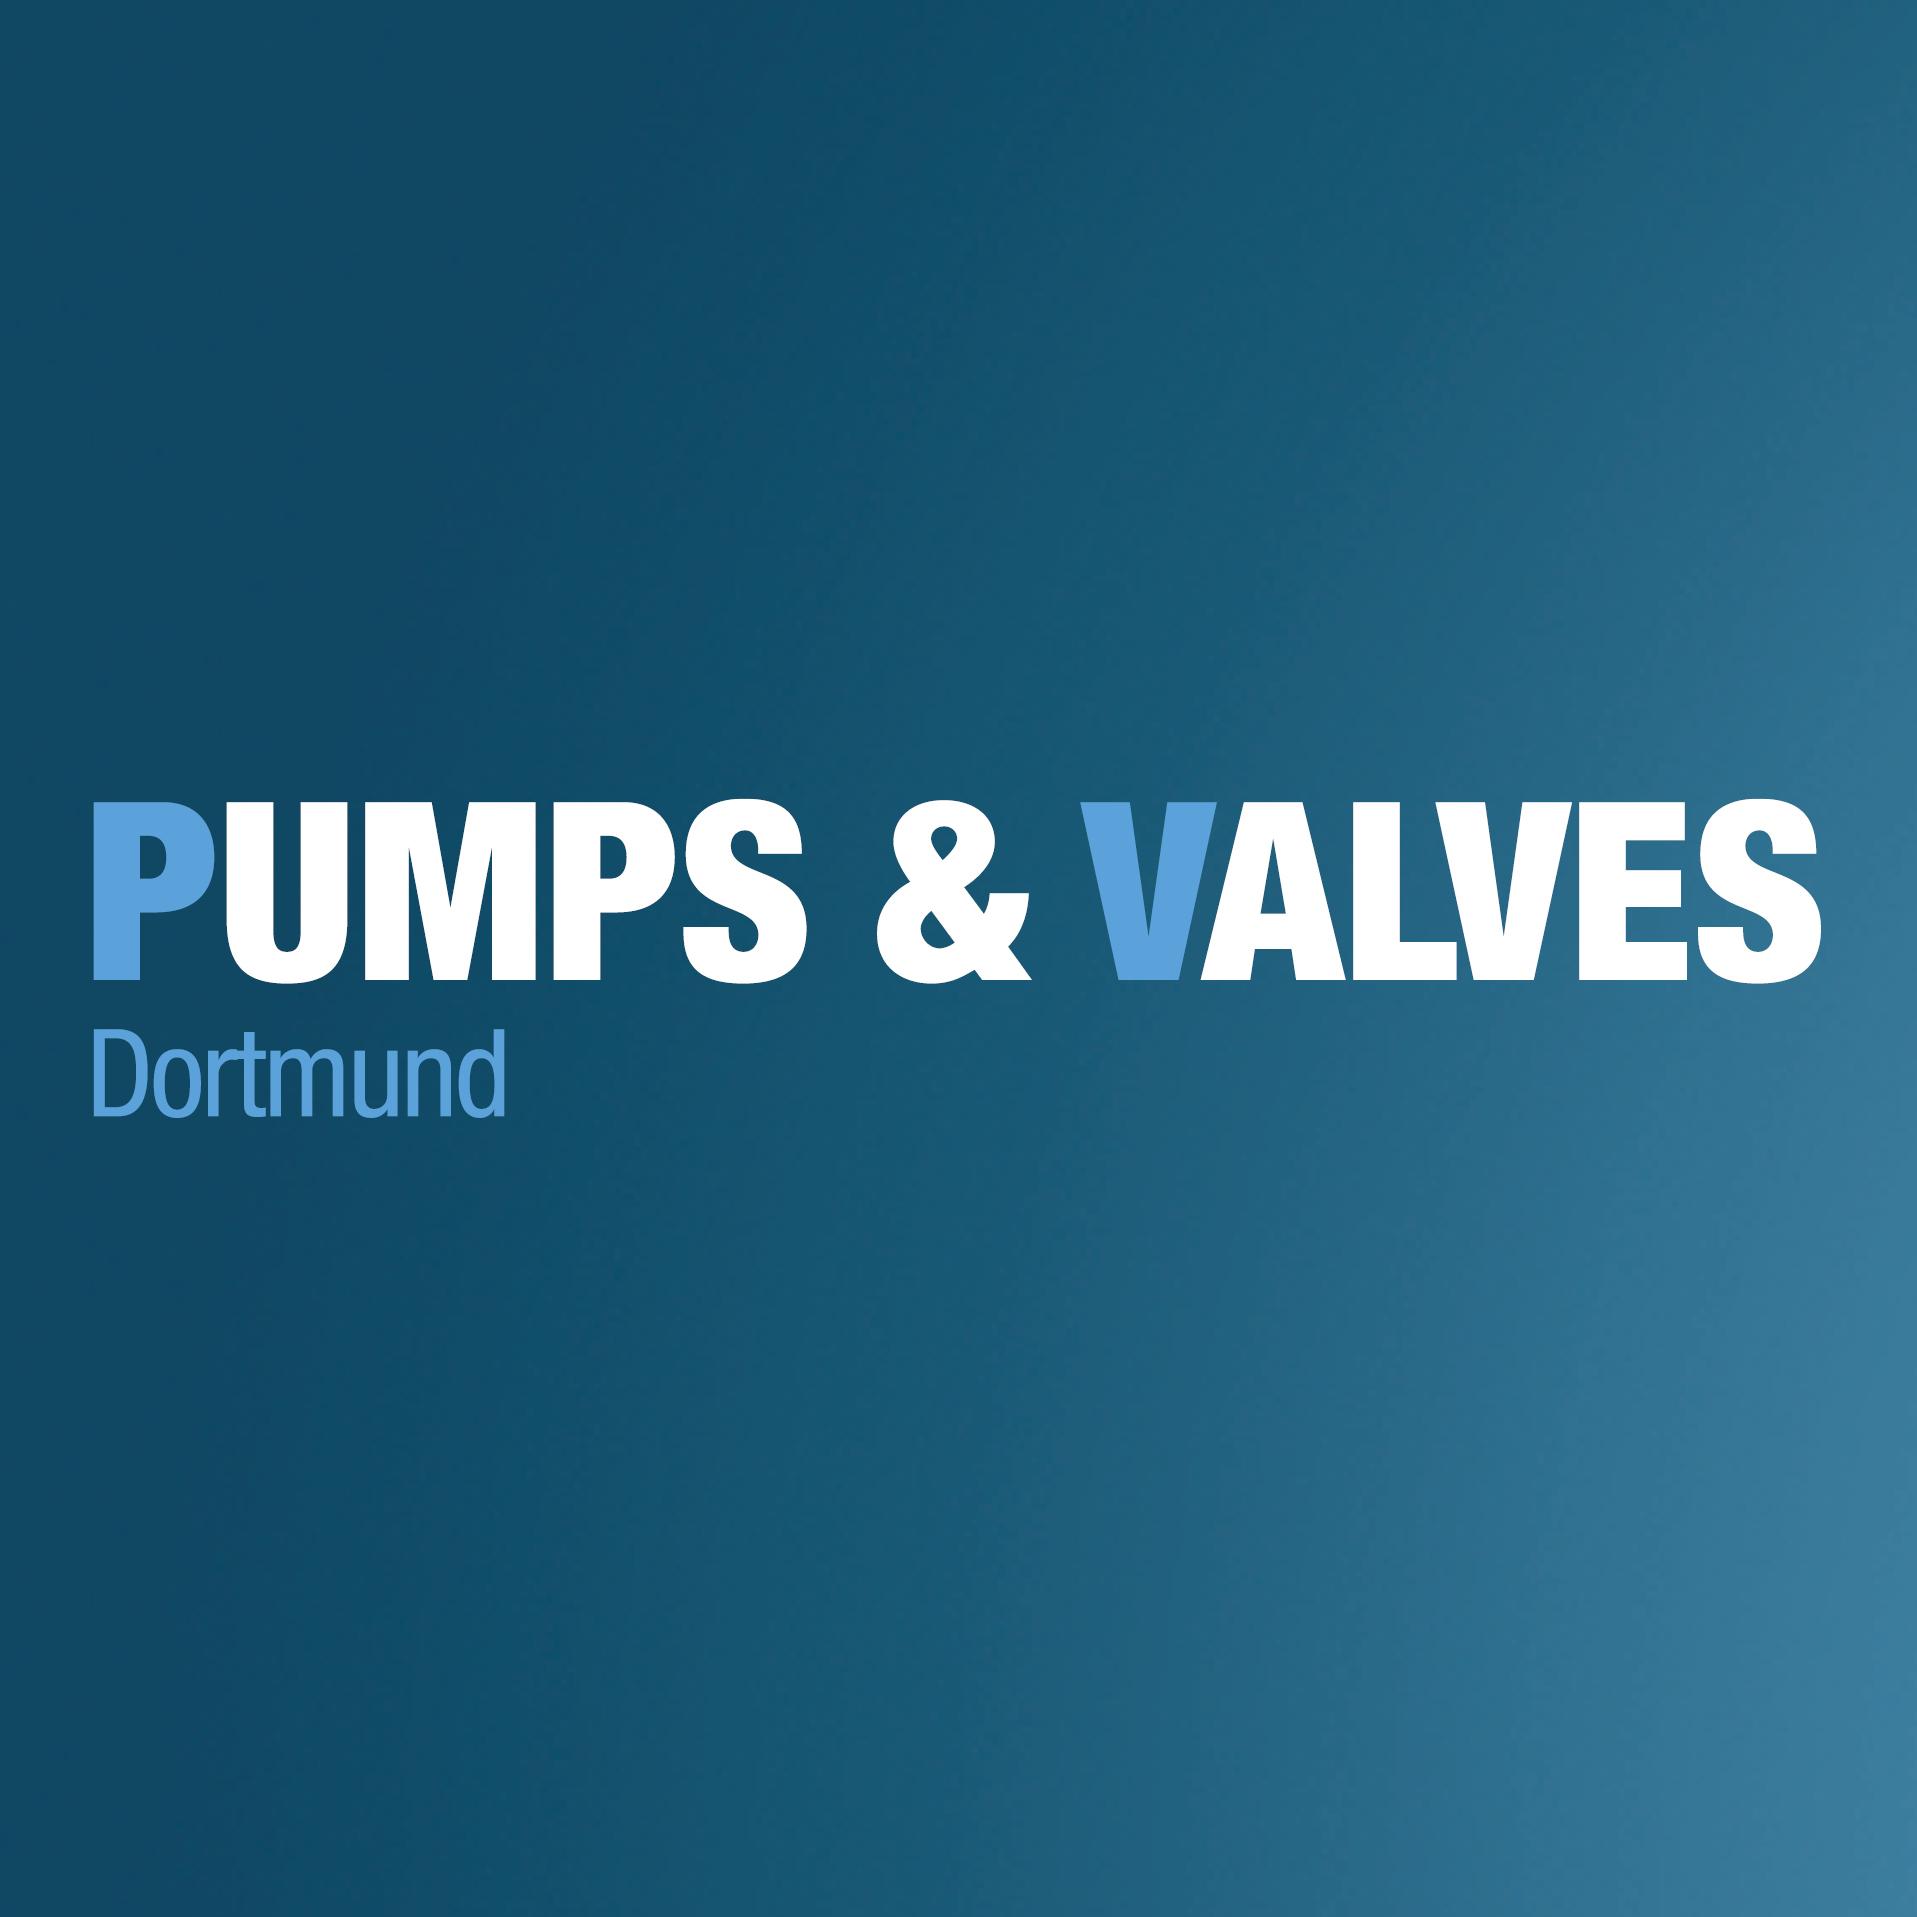 Westfalenhallen Dortmund Gmbh Pumps Valves Dortmund 2019 20022019